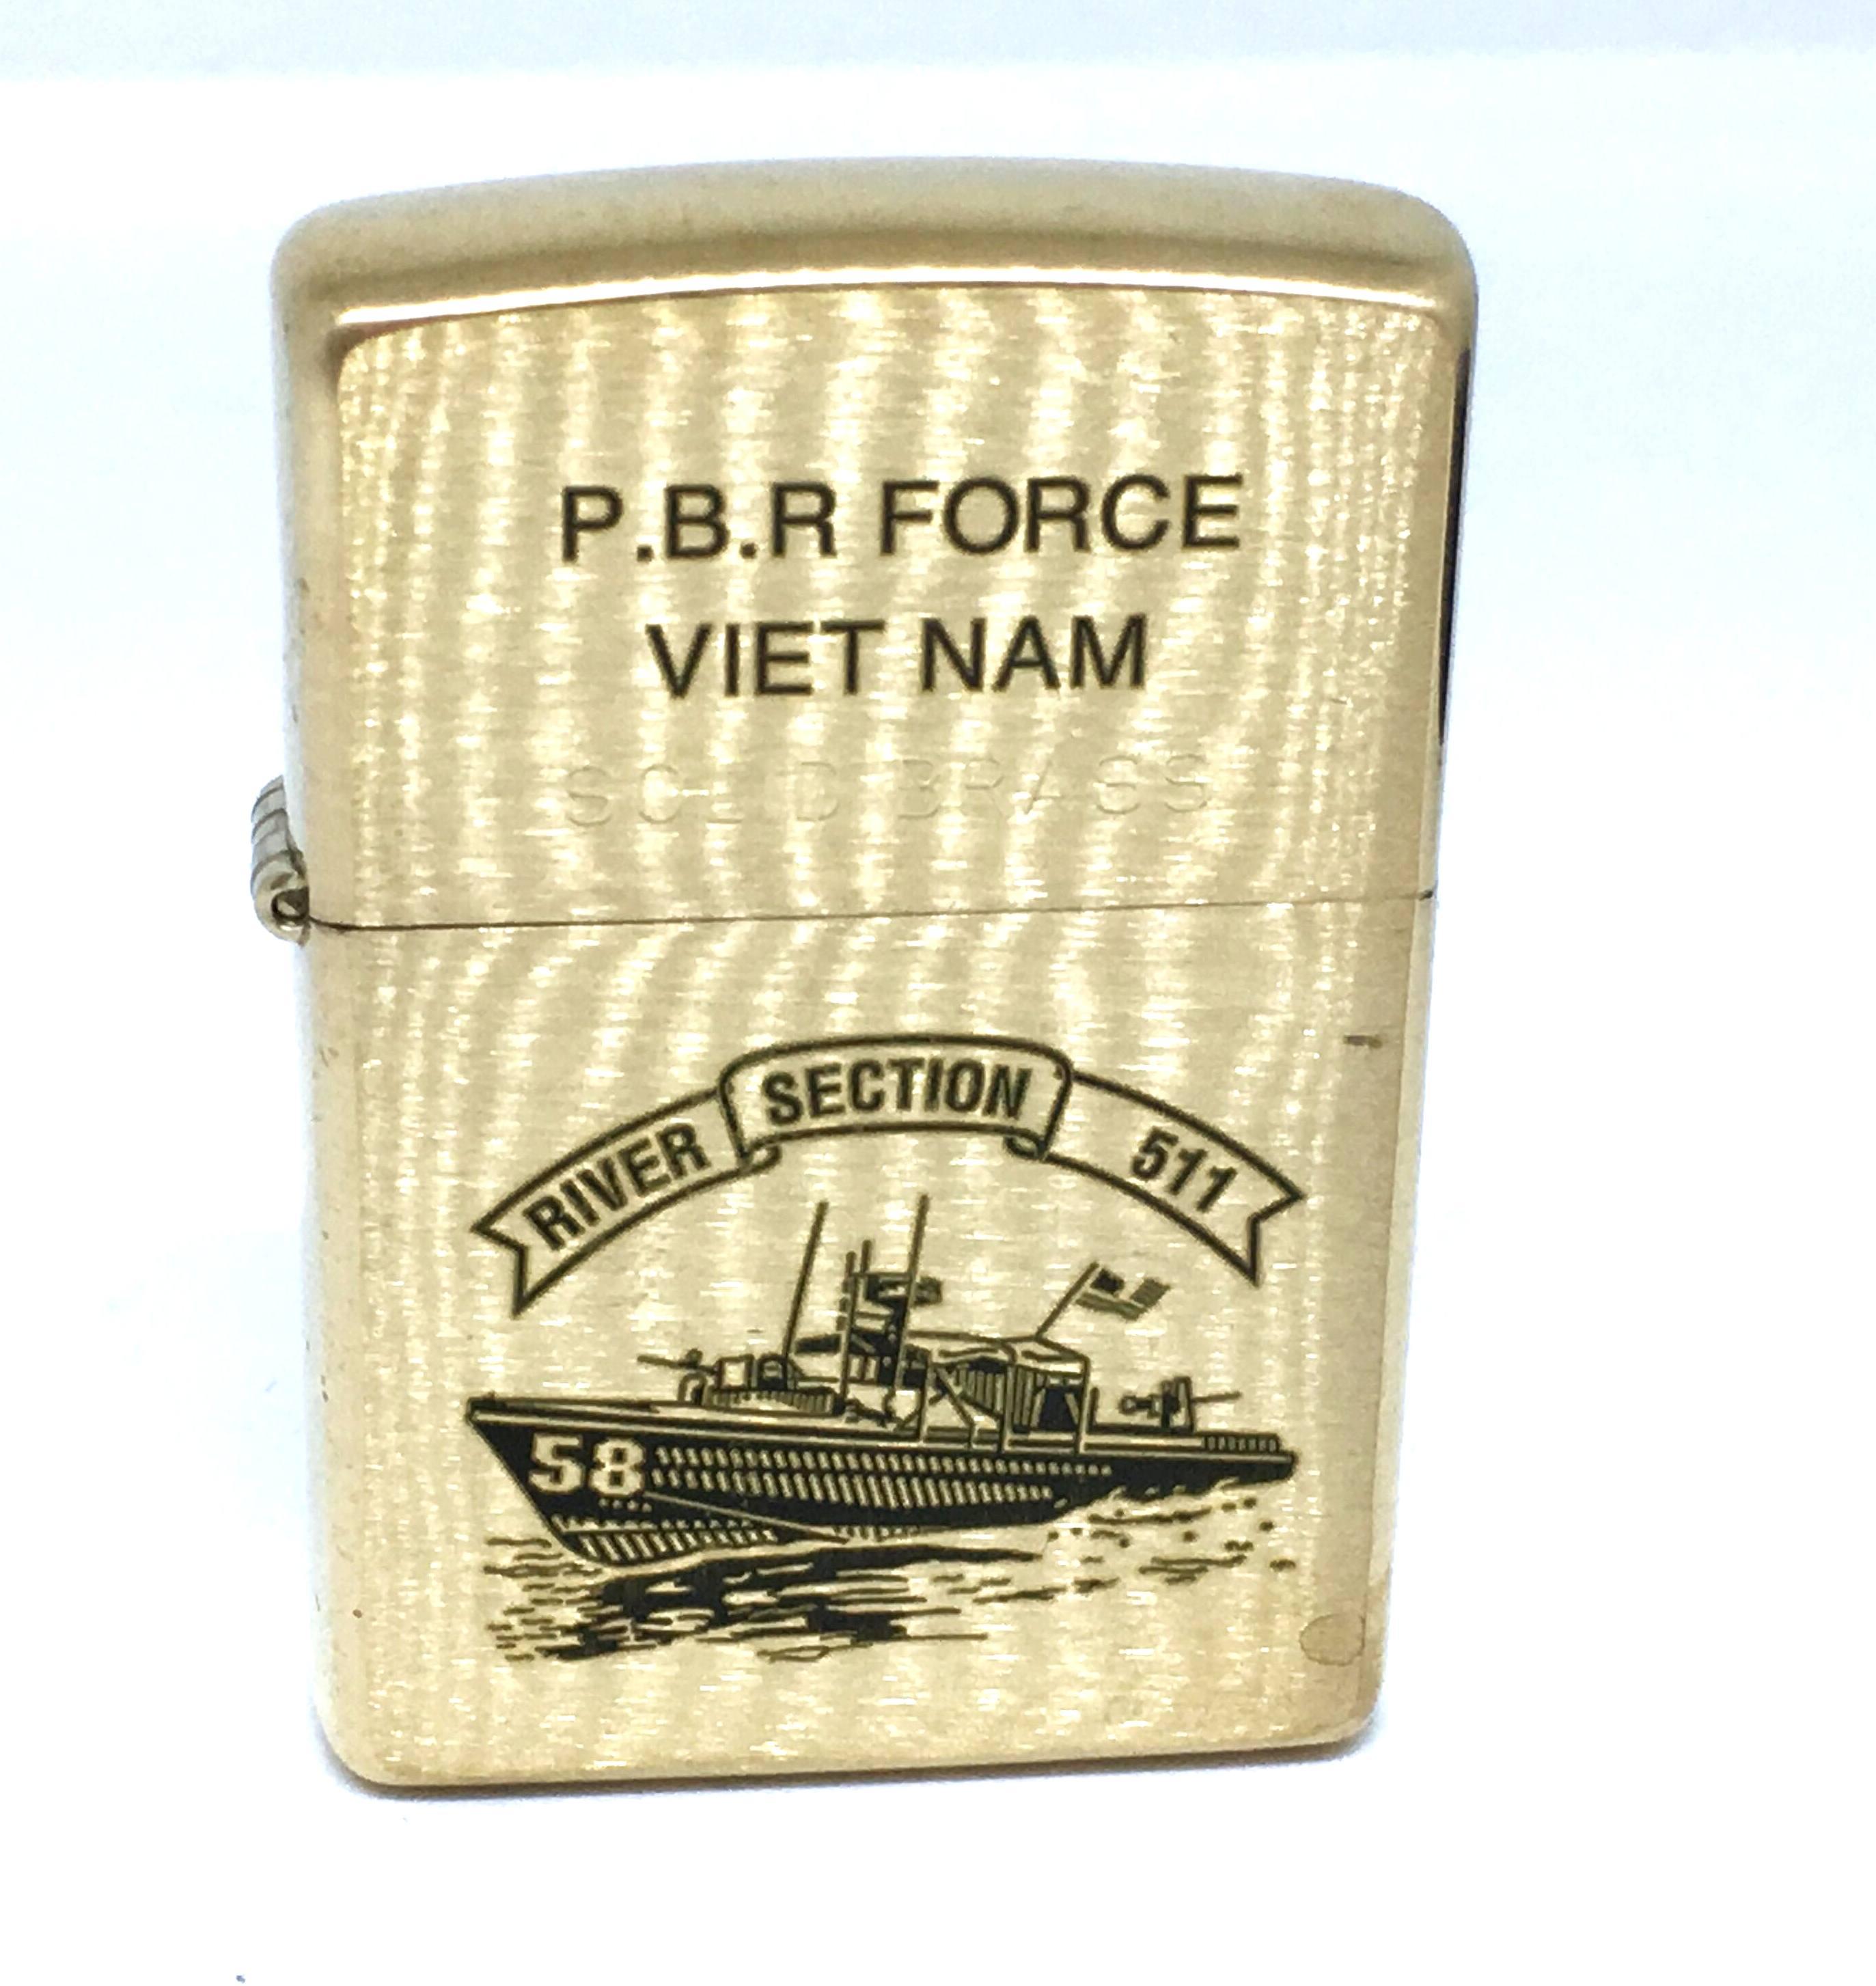 Zippo vang nham khac laze P.B.R FORCE VIET NAM  NTZ705 2